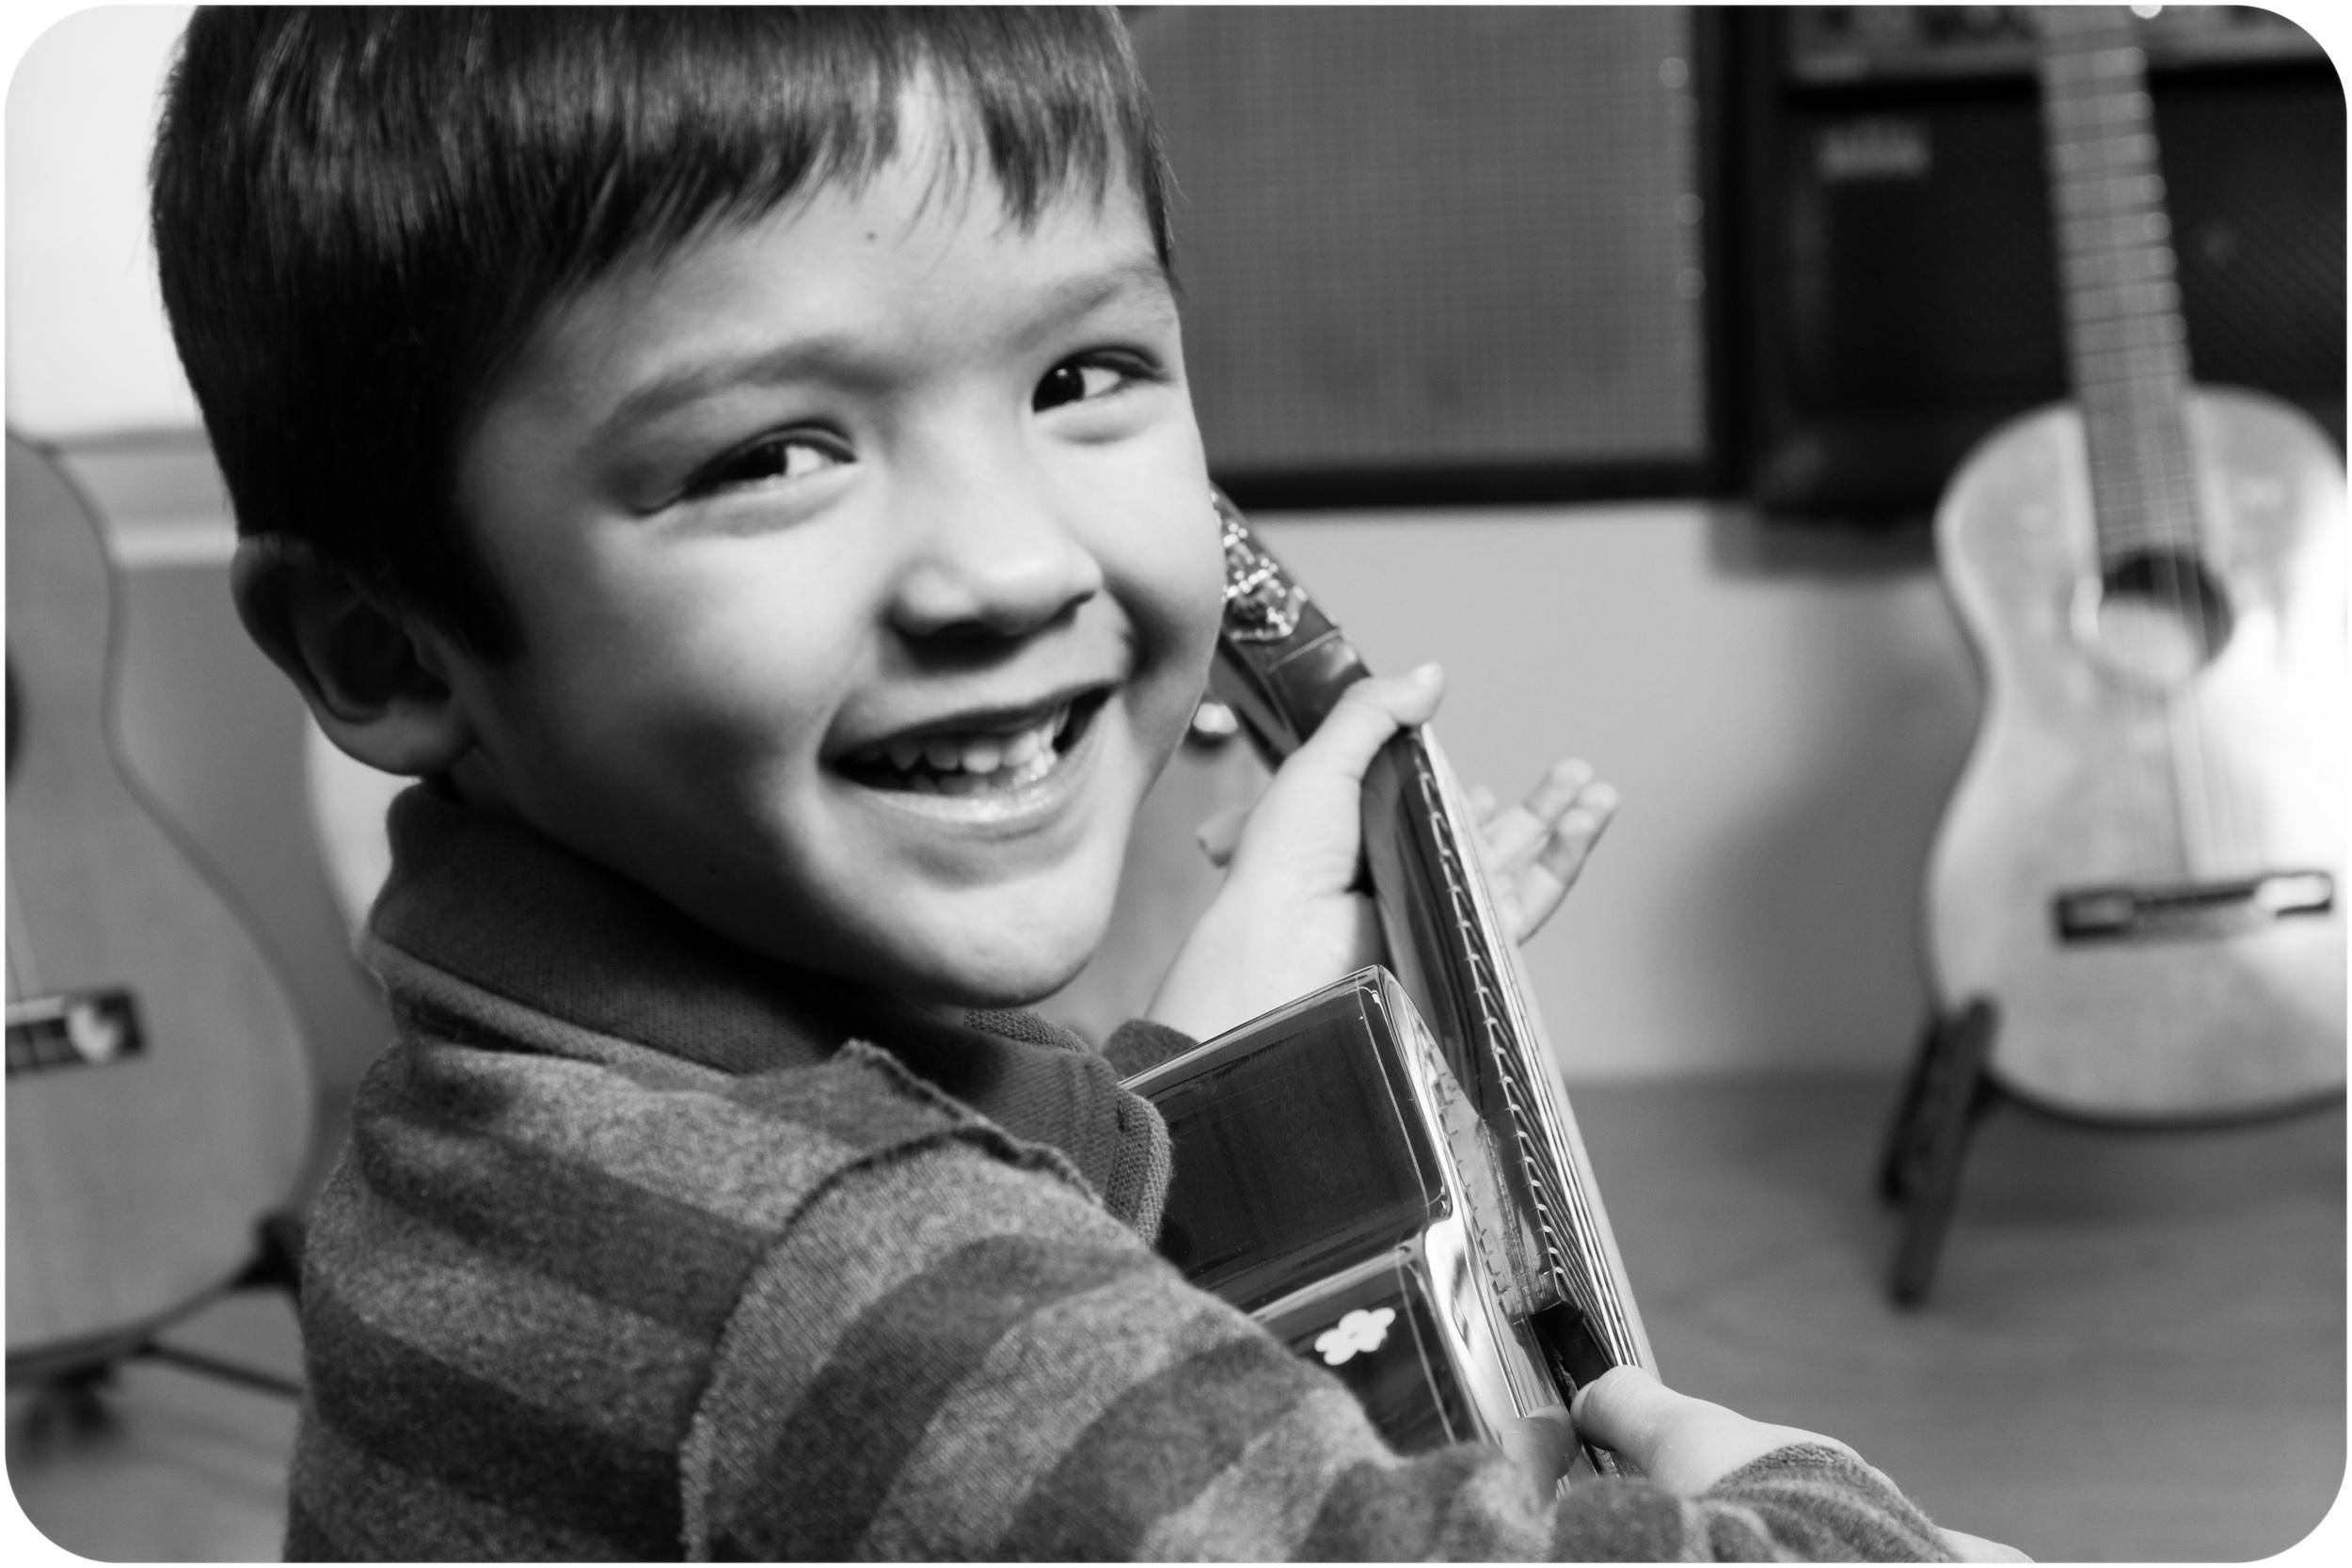 Noah's first guitar lesson.